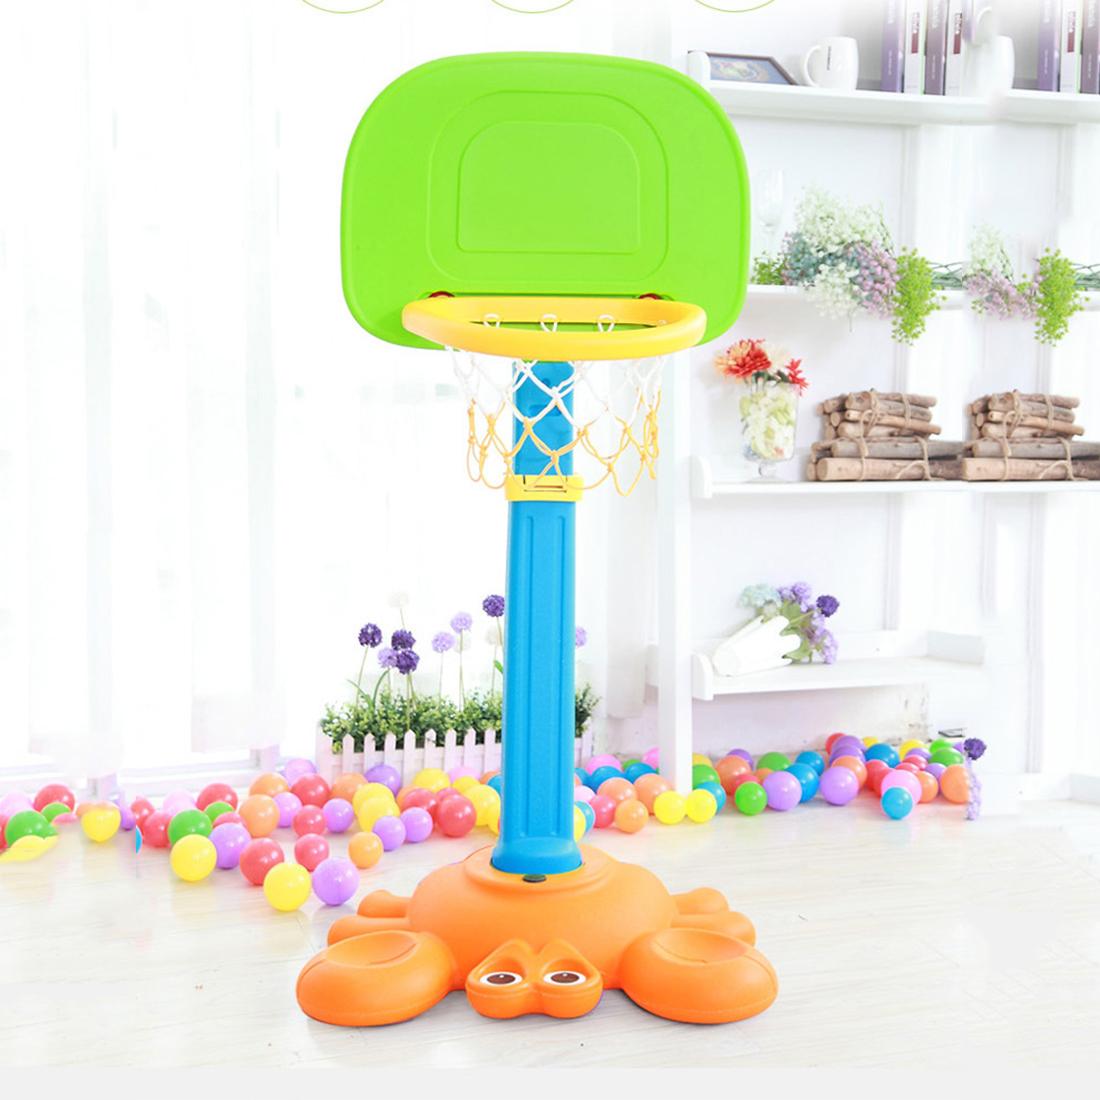 Kids Height Adjustable Portable Basketball Toy Basketball Hoop with A Ball Magic Shot Random Color(China (Mainland))